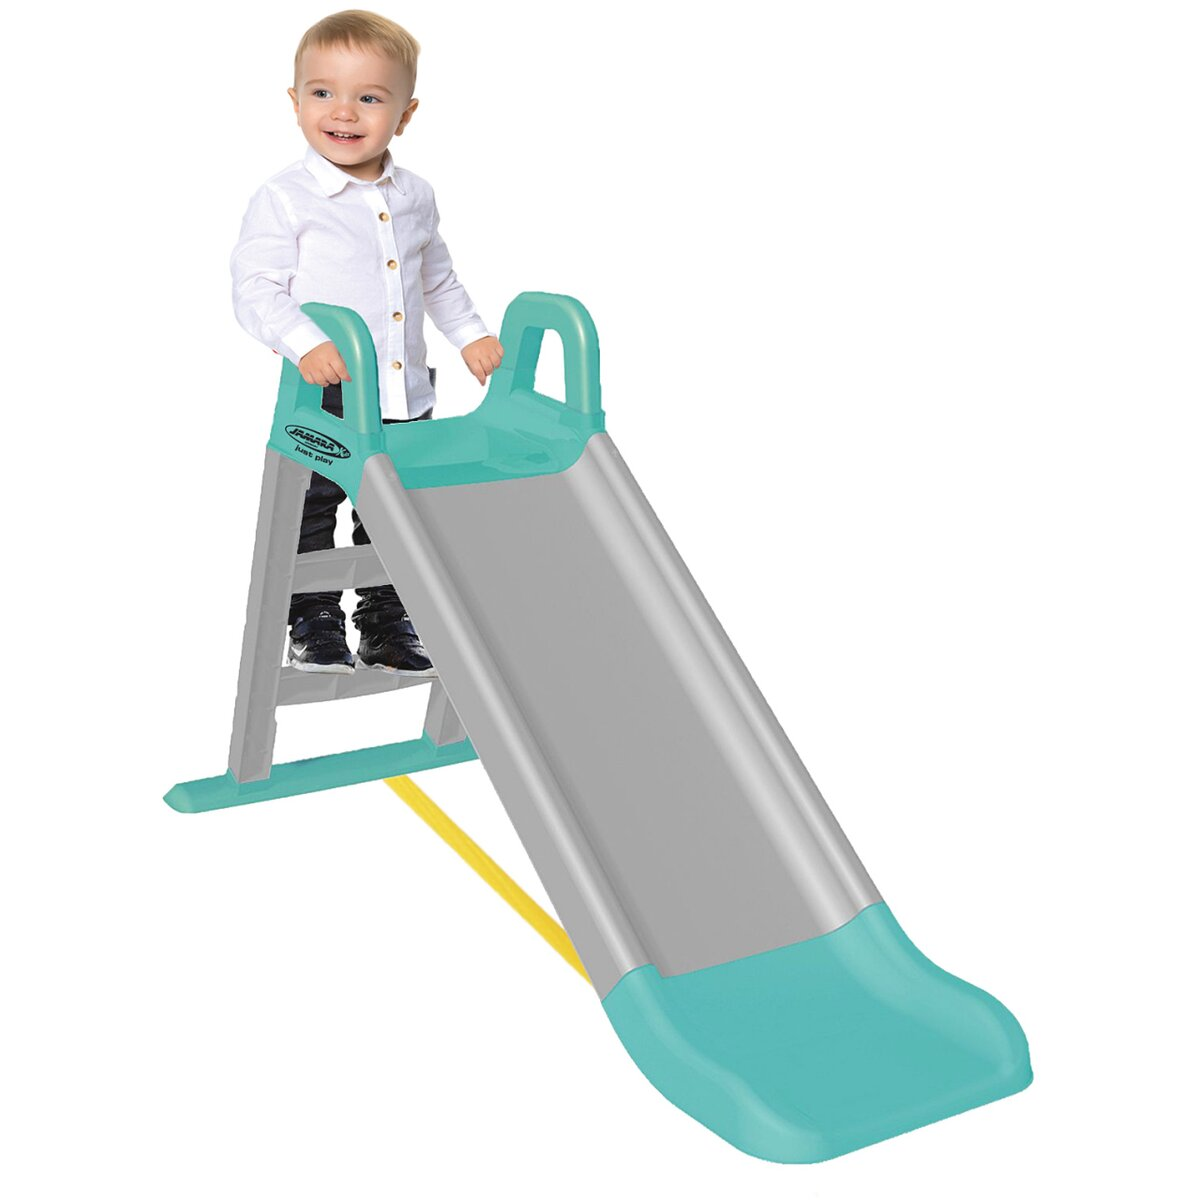 Rutsche Funny Slide grau